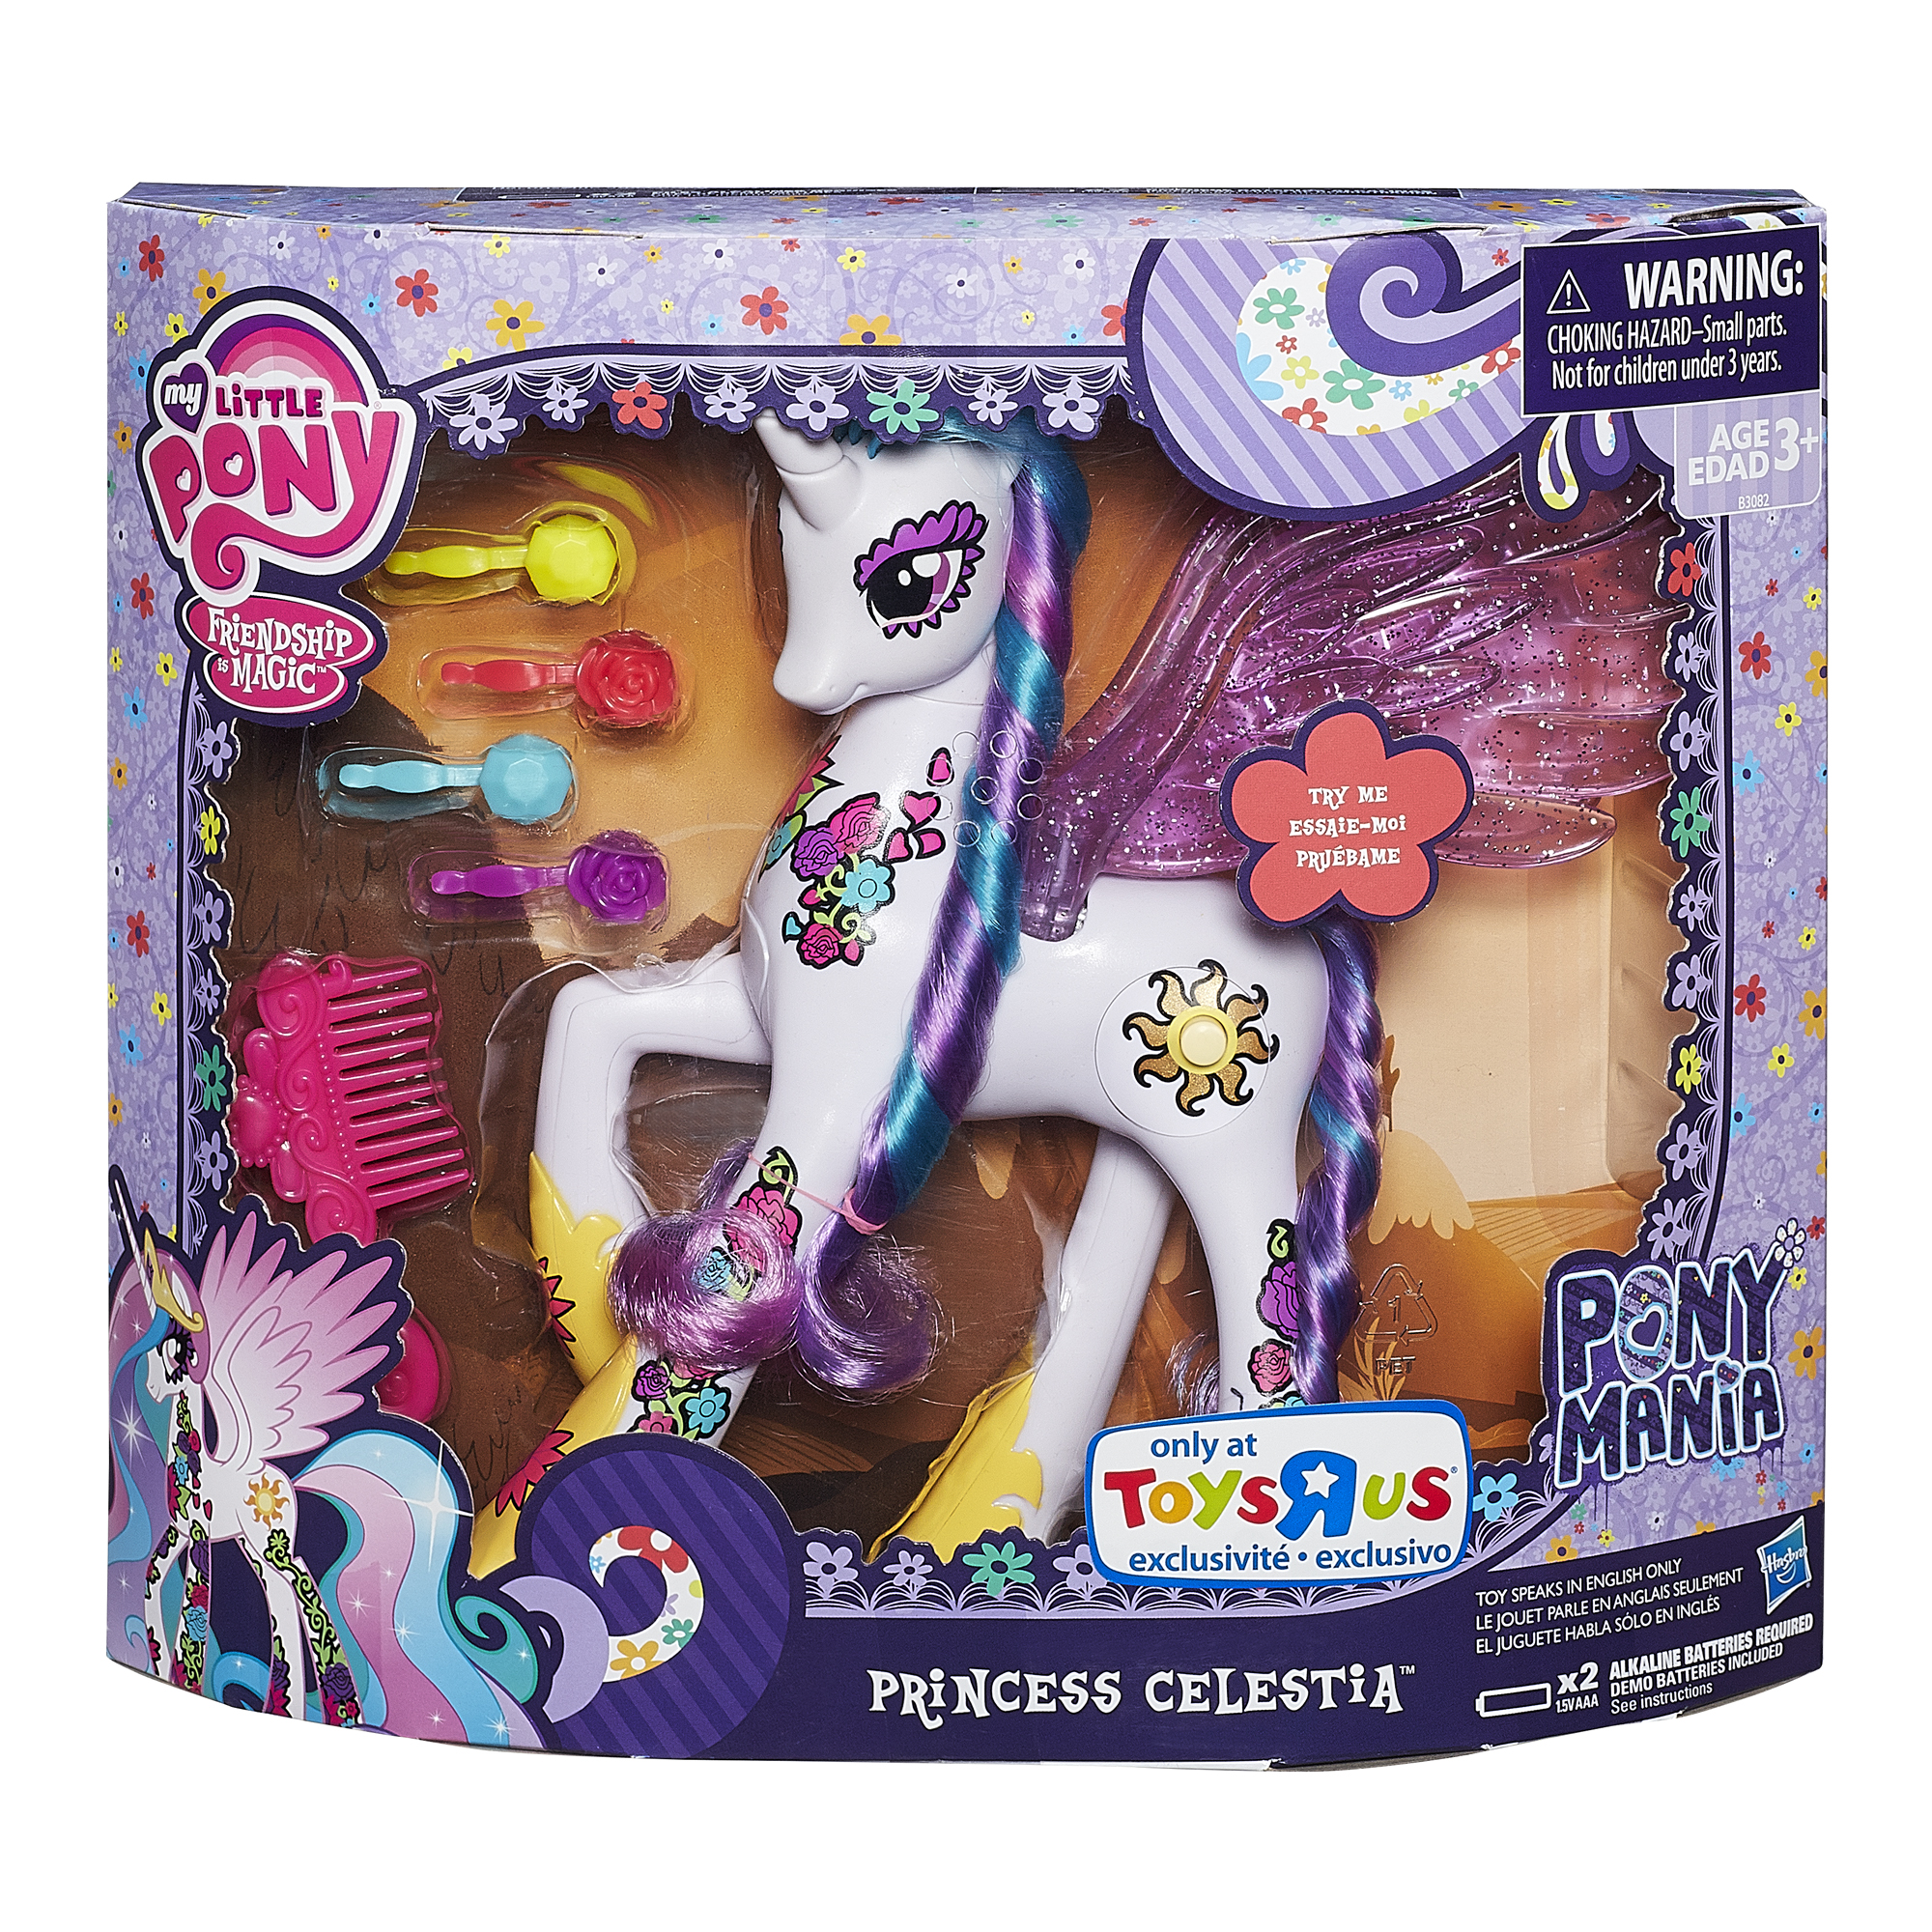 mlp-princess-celestia-in-package--141325